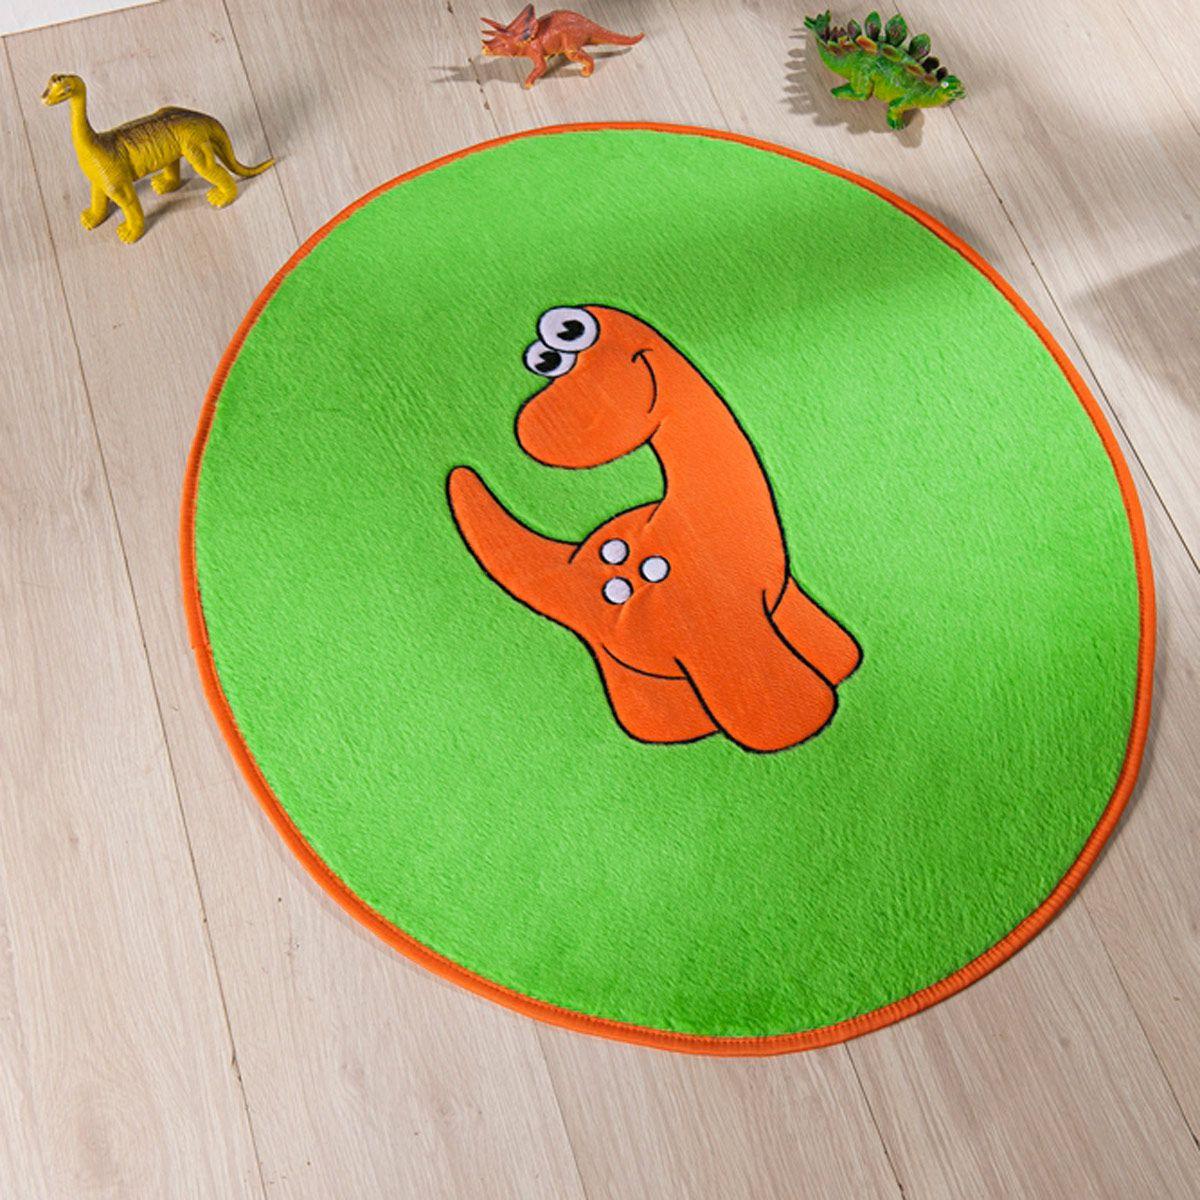 Tapete Infantil Premium Formato Dino Baby Verde Pistache 78cm x 68cm